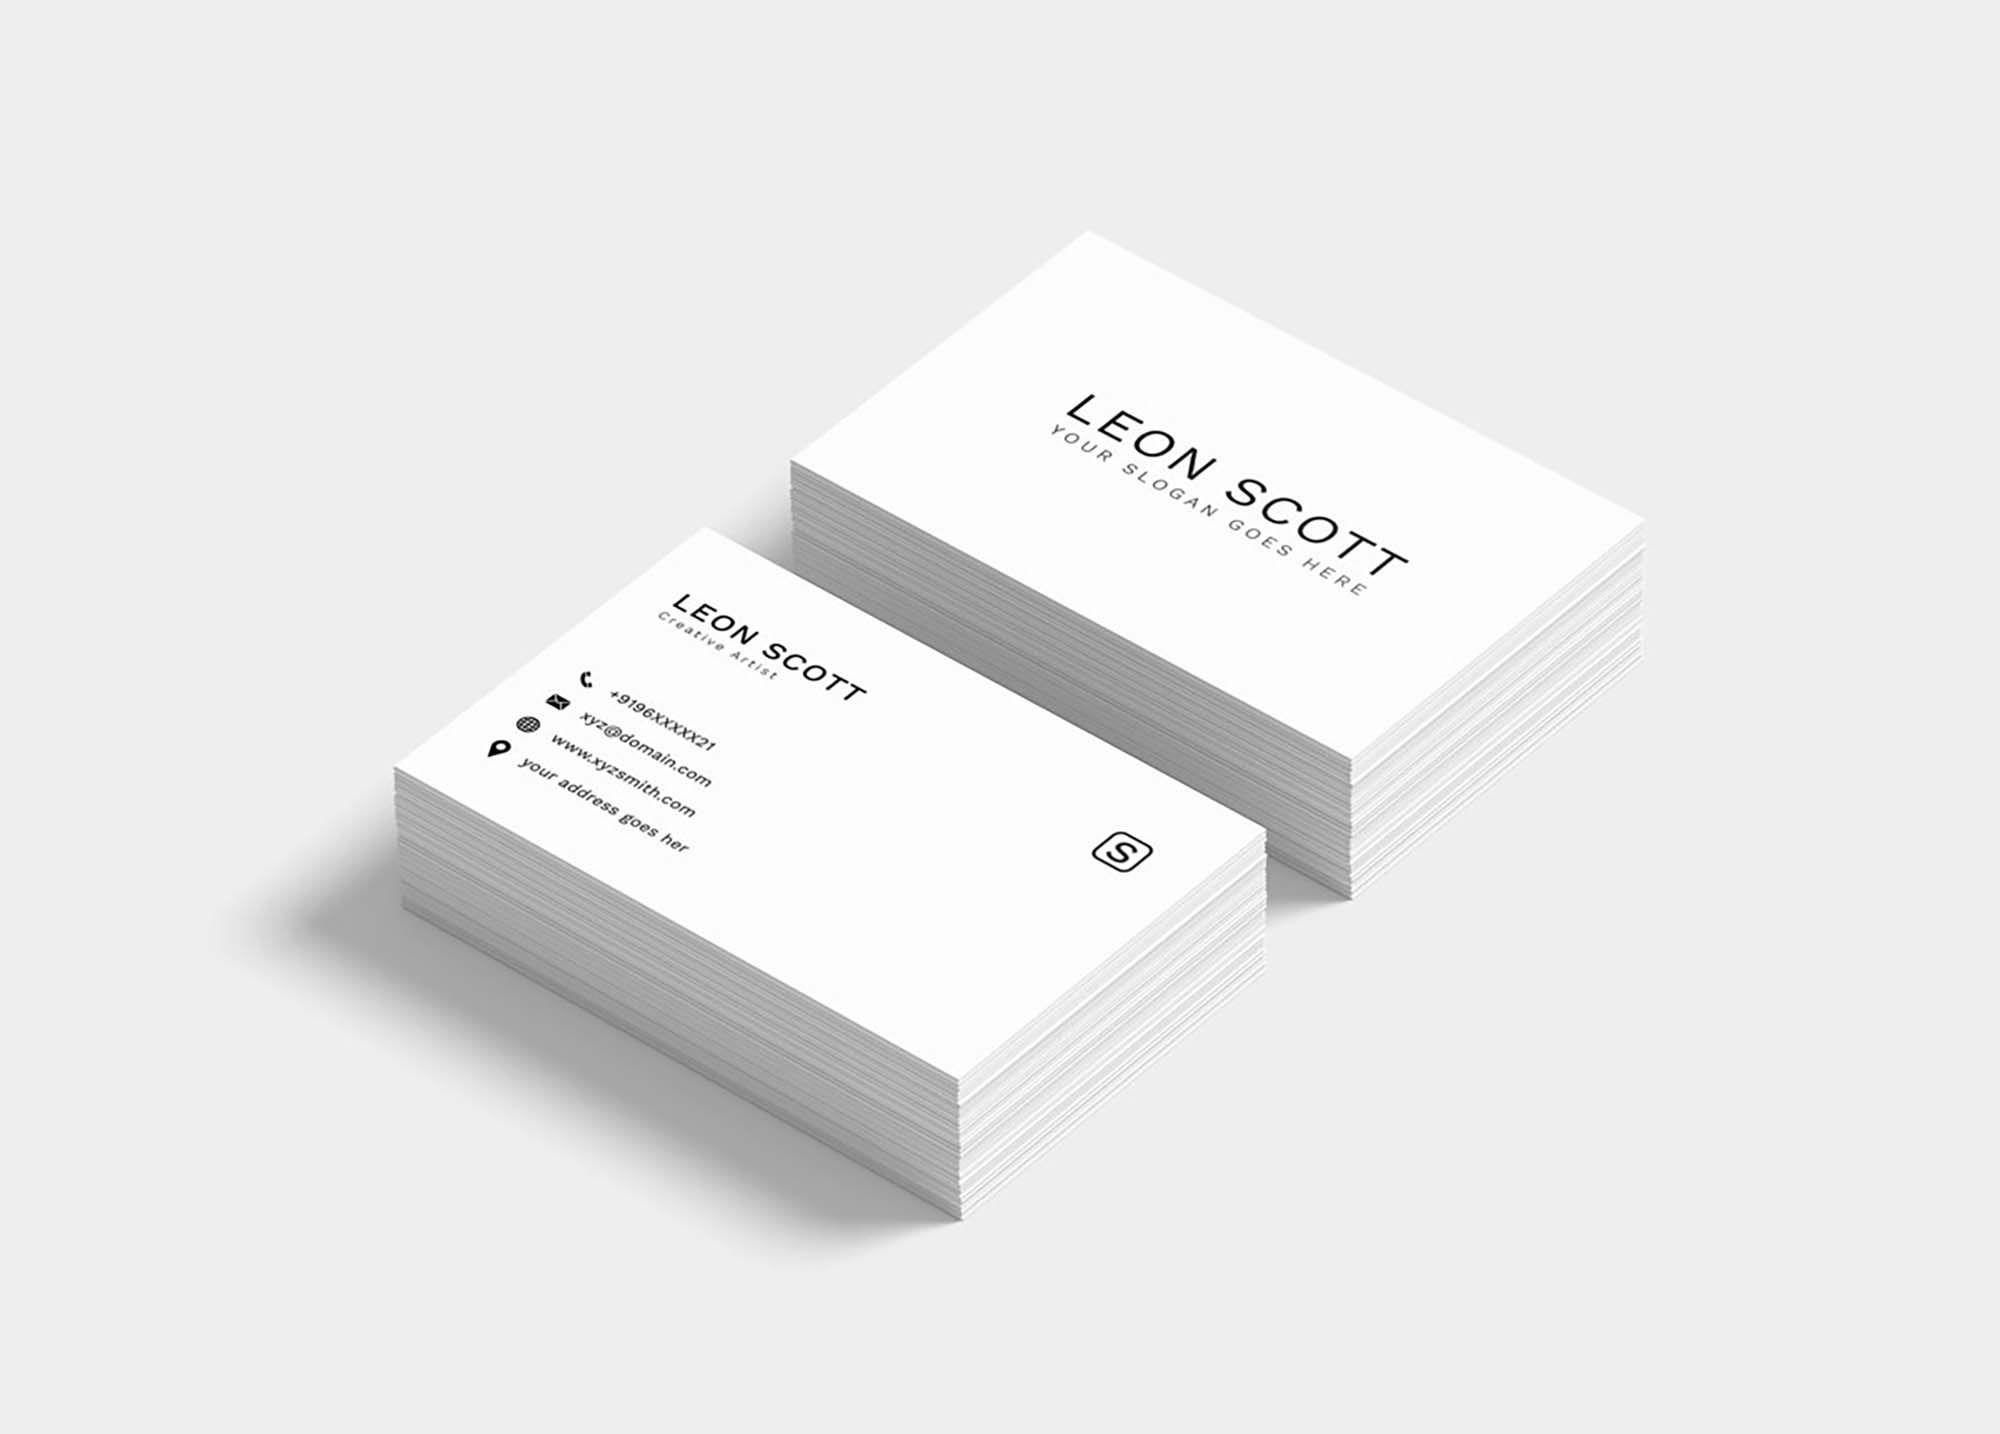 006 Singular Minimalist Busines Card Template Psd Free Highest Clarity Full